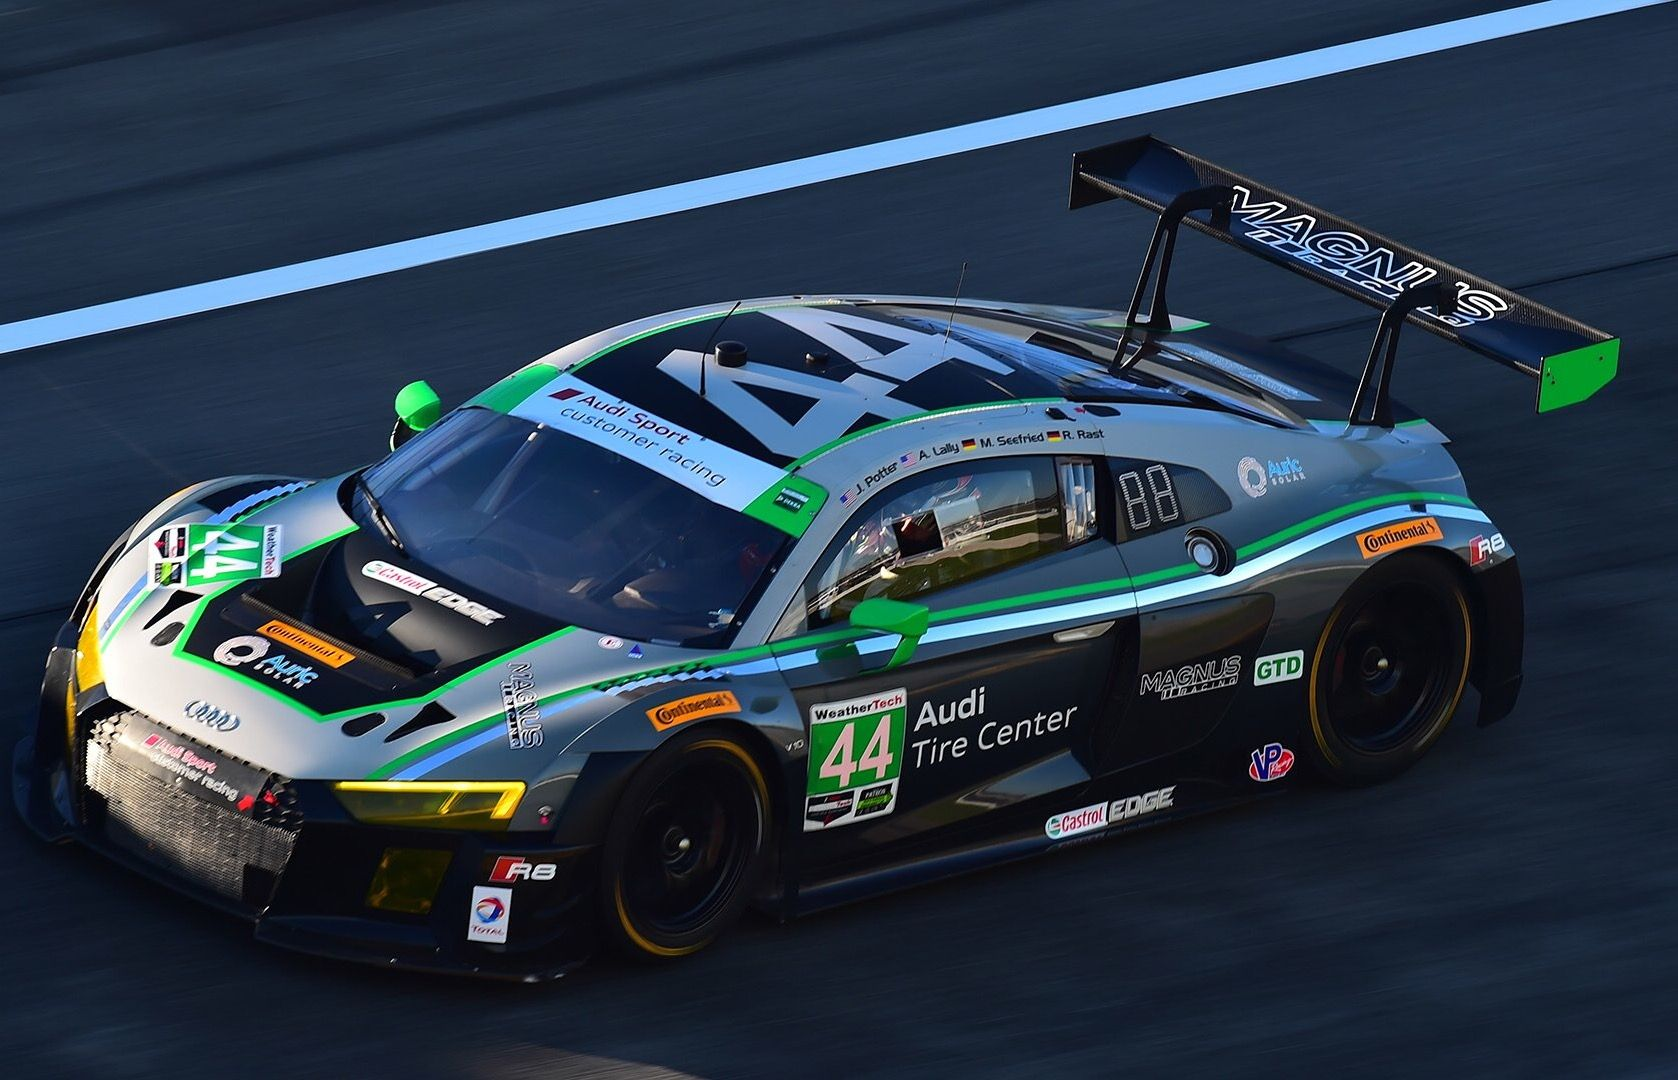 The #44 Magnus Racing Audi R8 LMS wins the twenty-four classic